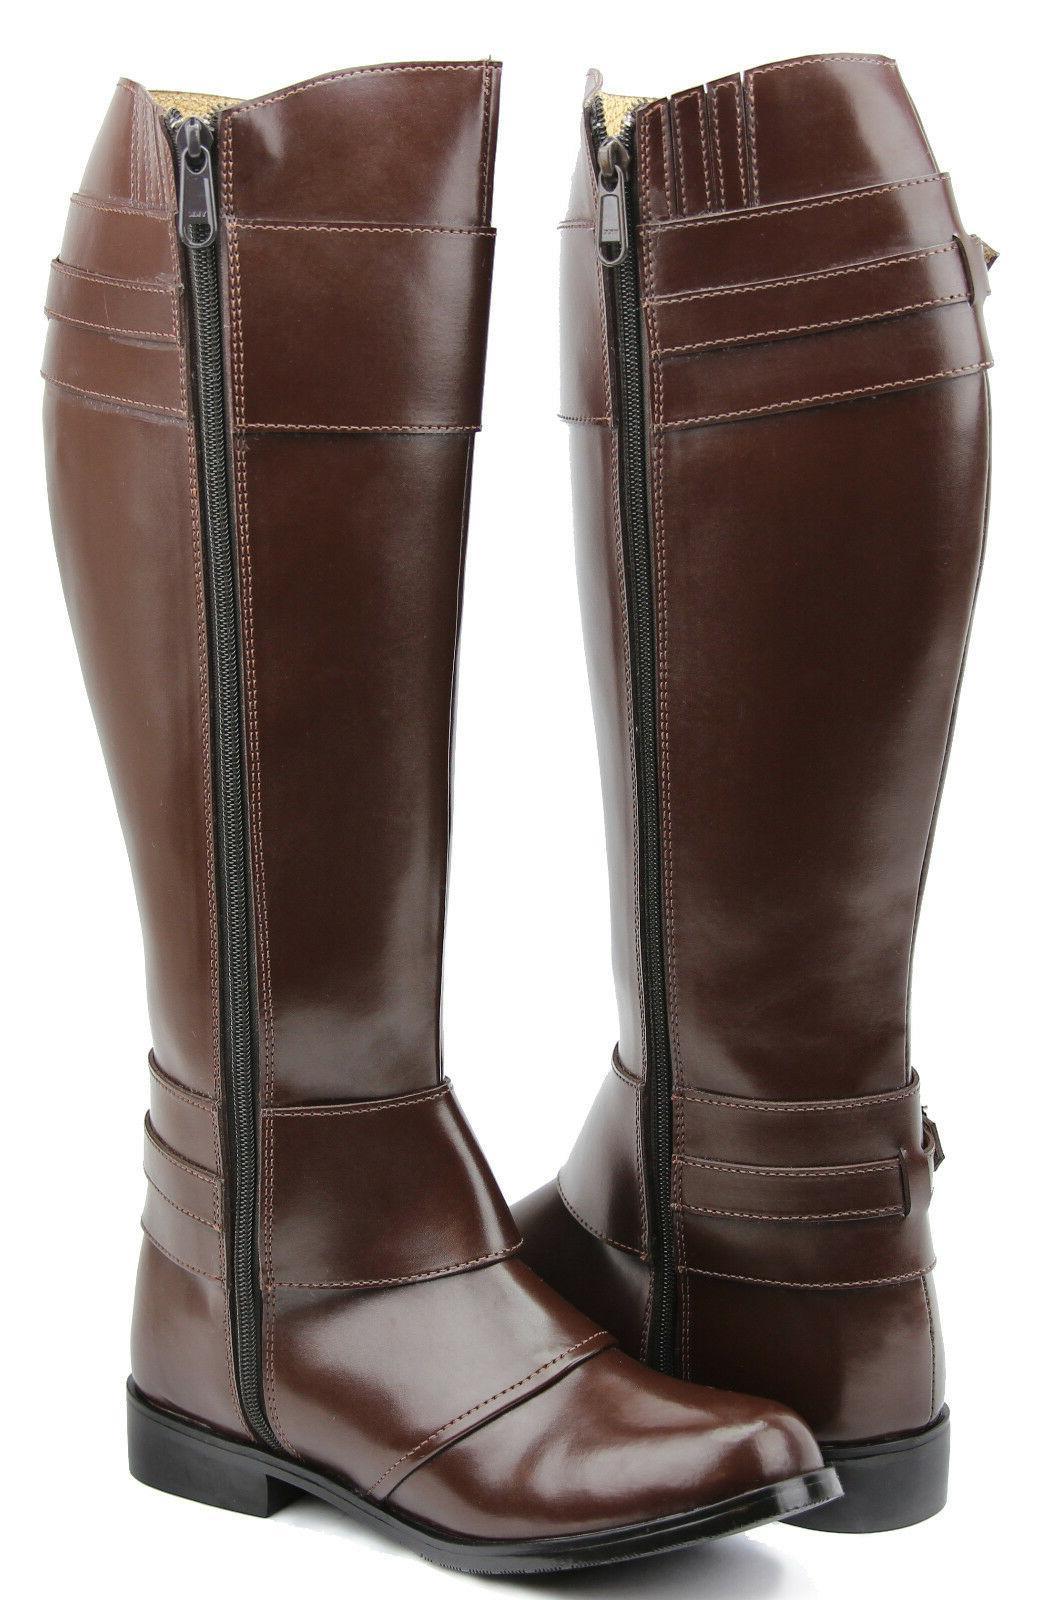 FAMMZ Ladies Fashion Tall Knee High Boots